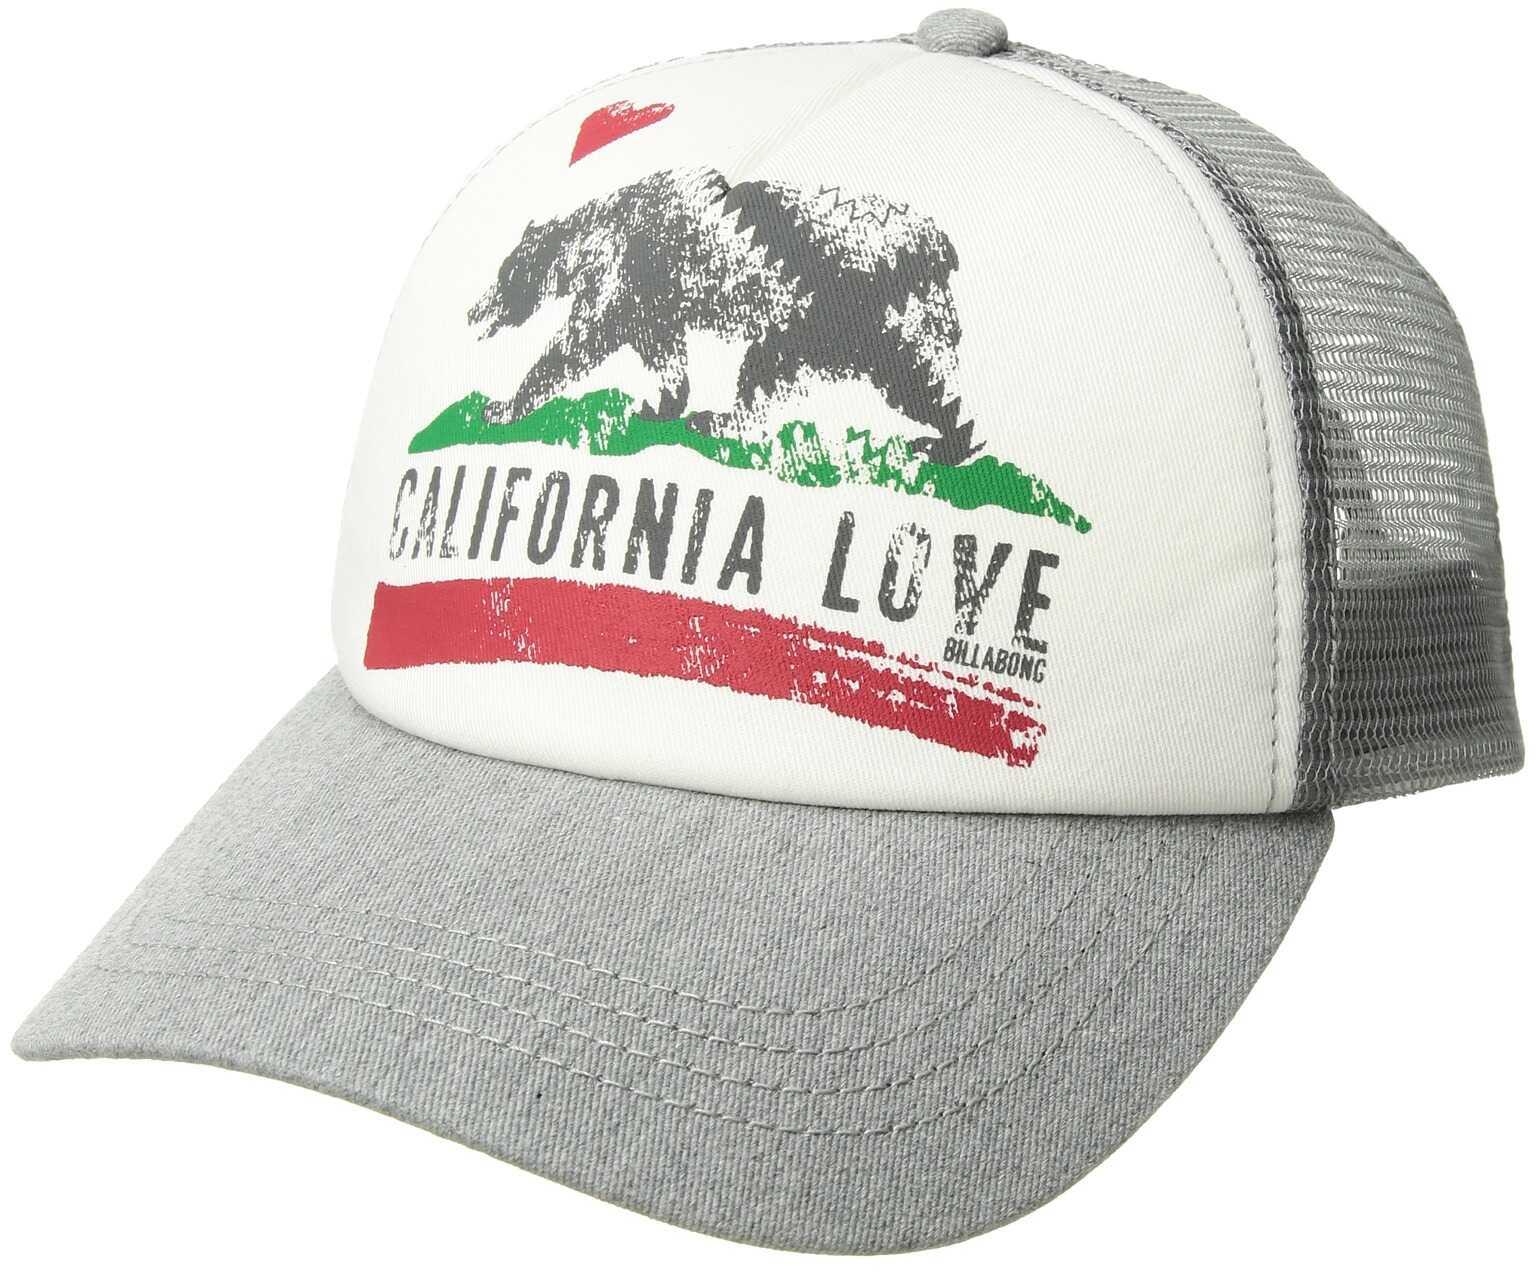 Billabong Pitstop Hat Athletic Grey